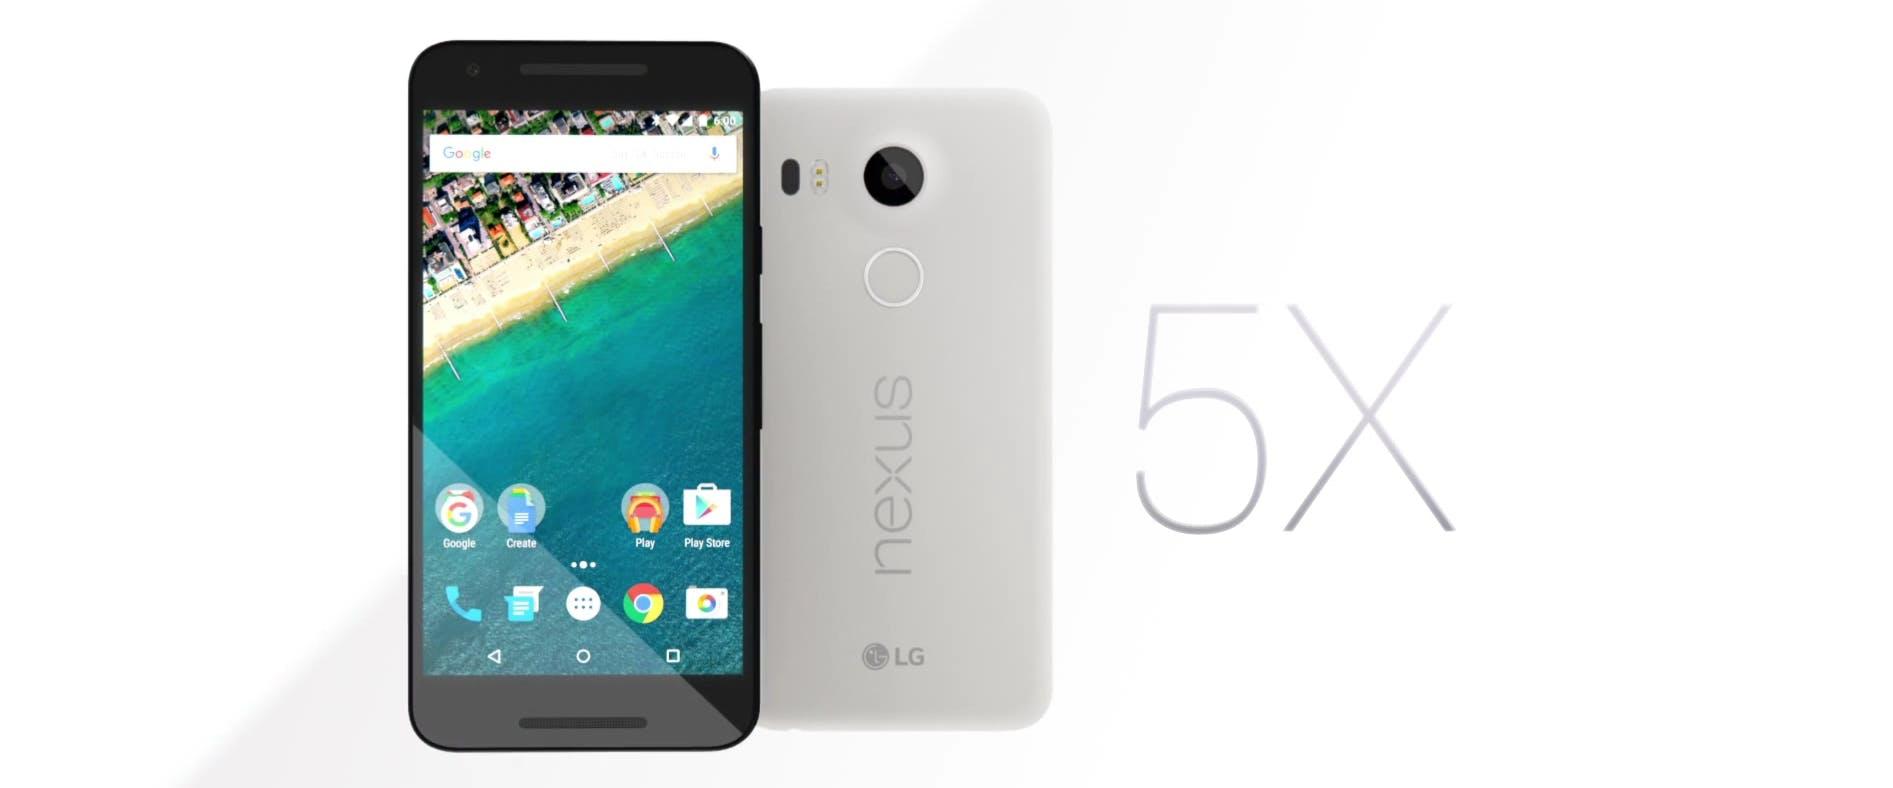 google-lg-nexus-5x